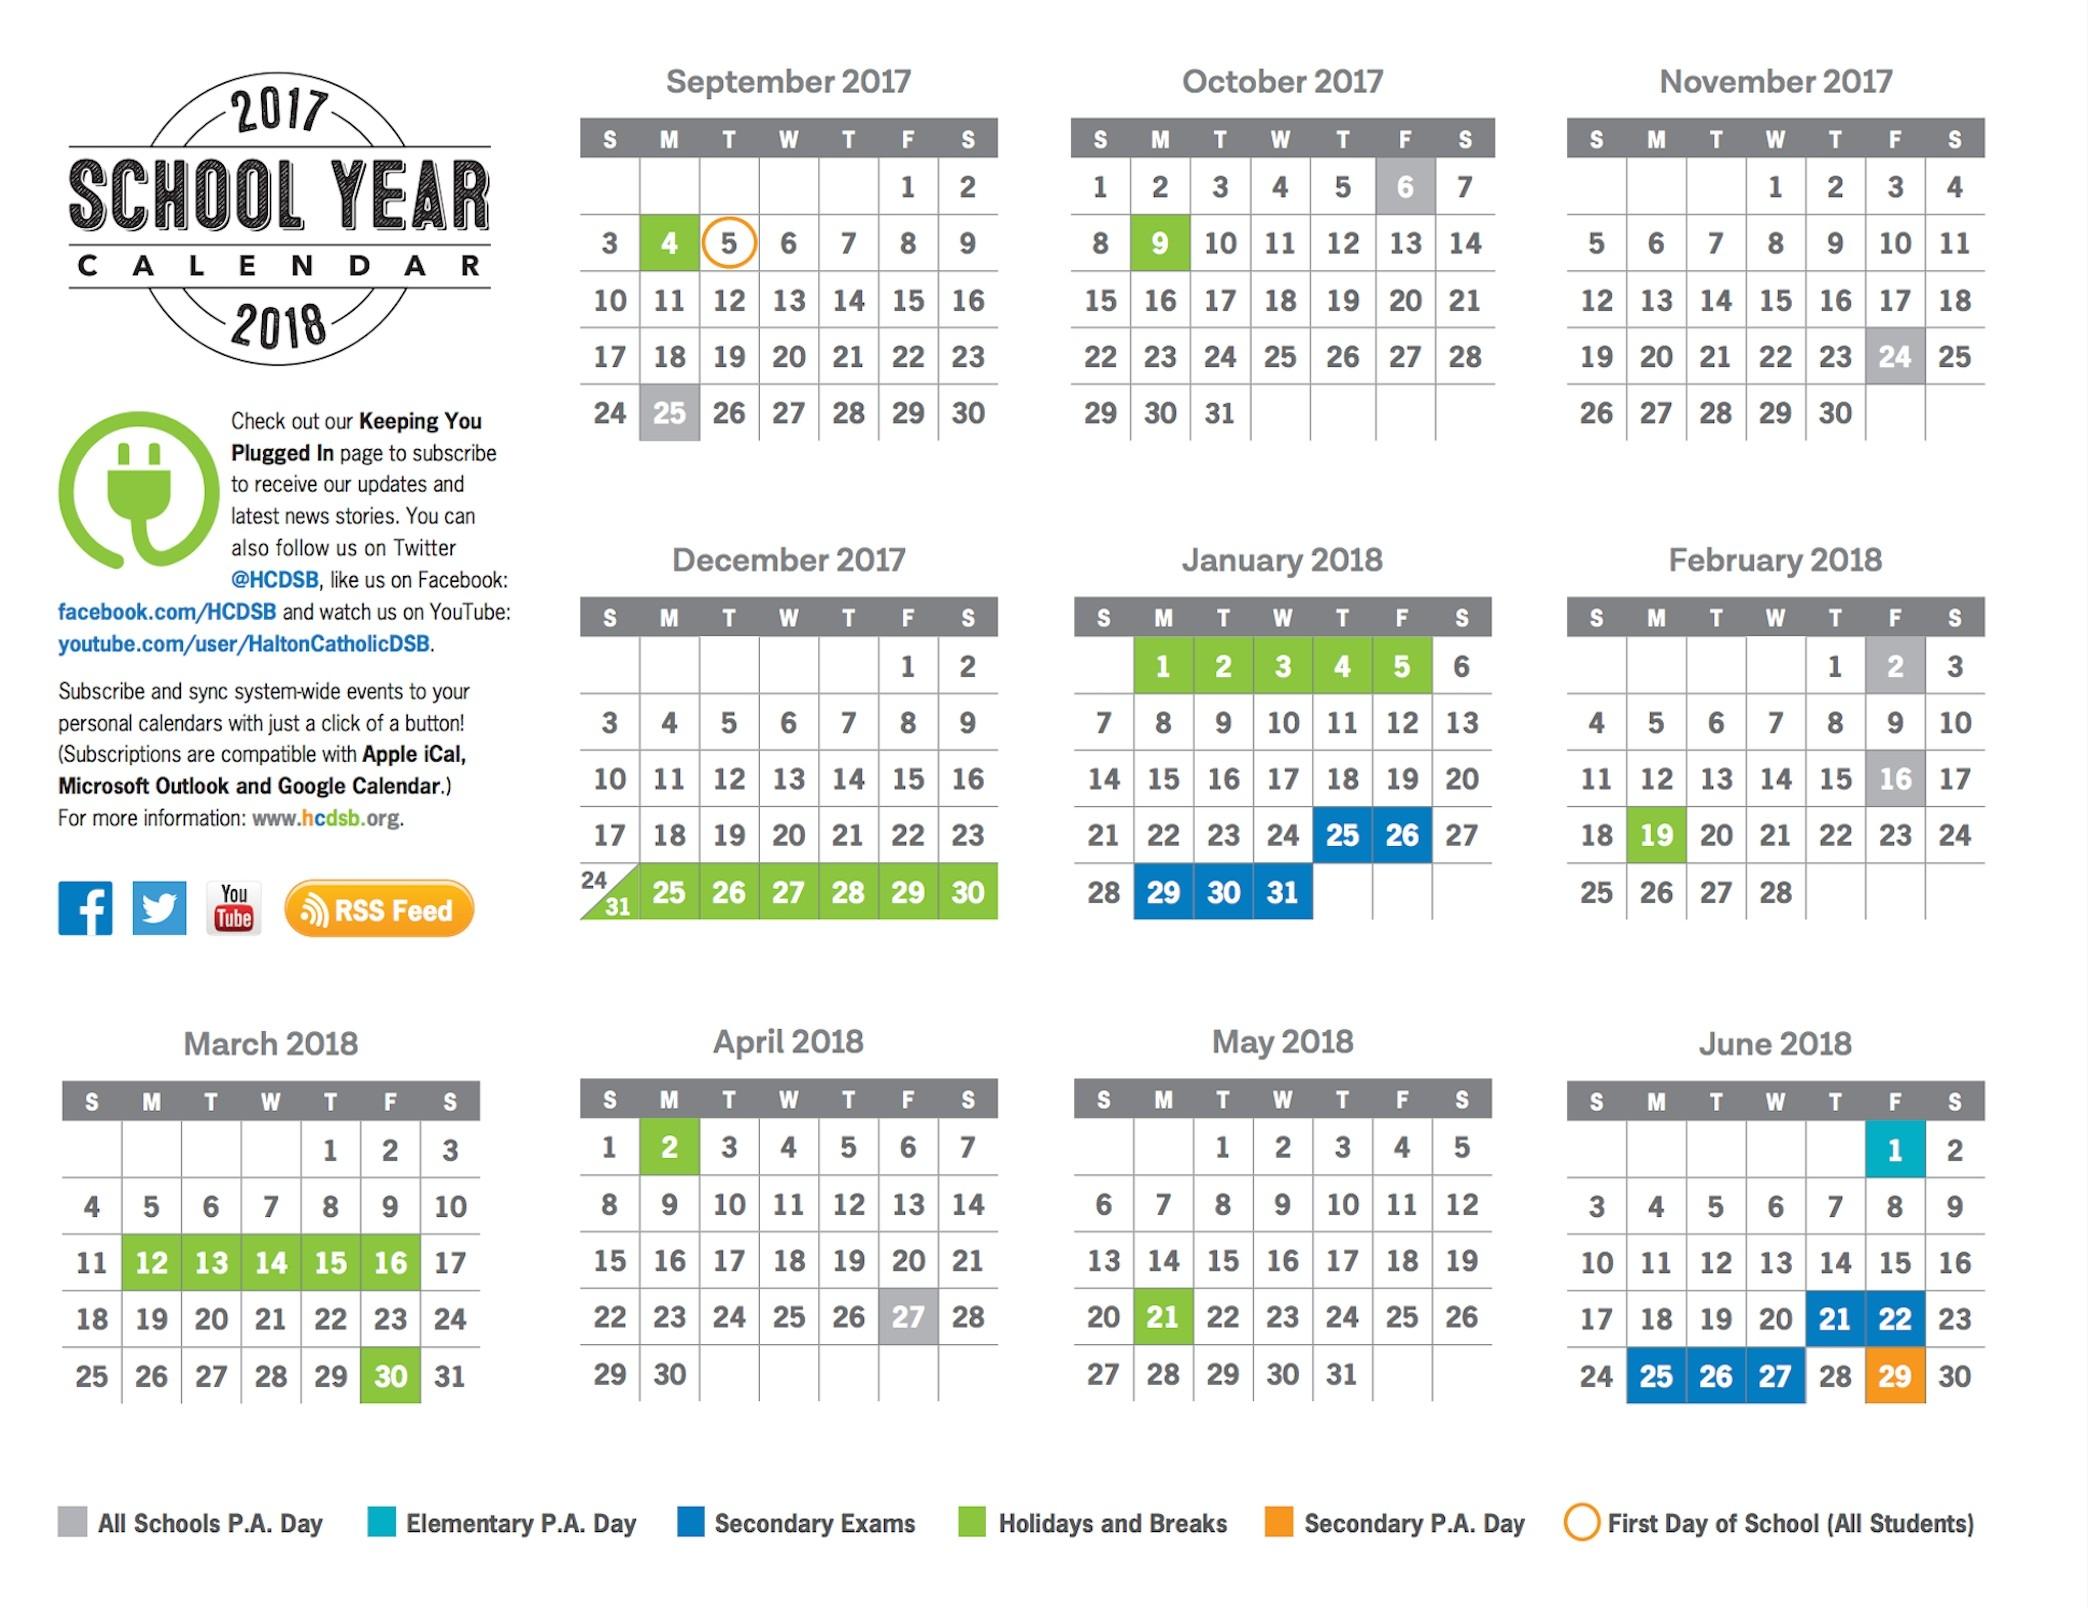 Ascension Parish School Calendar 2018-2019 Printable For Cost-Free_School Calendar Ascension Parish